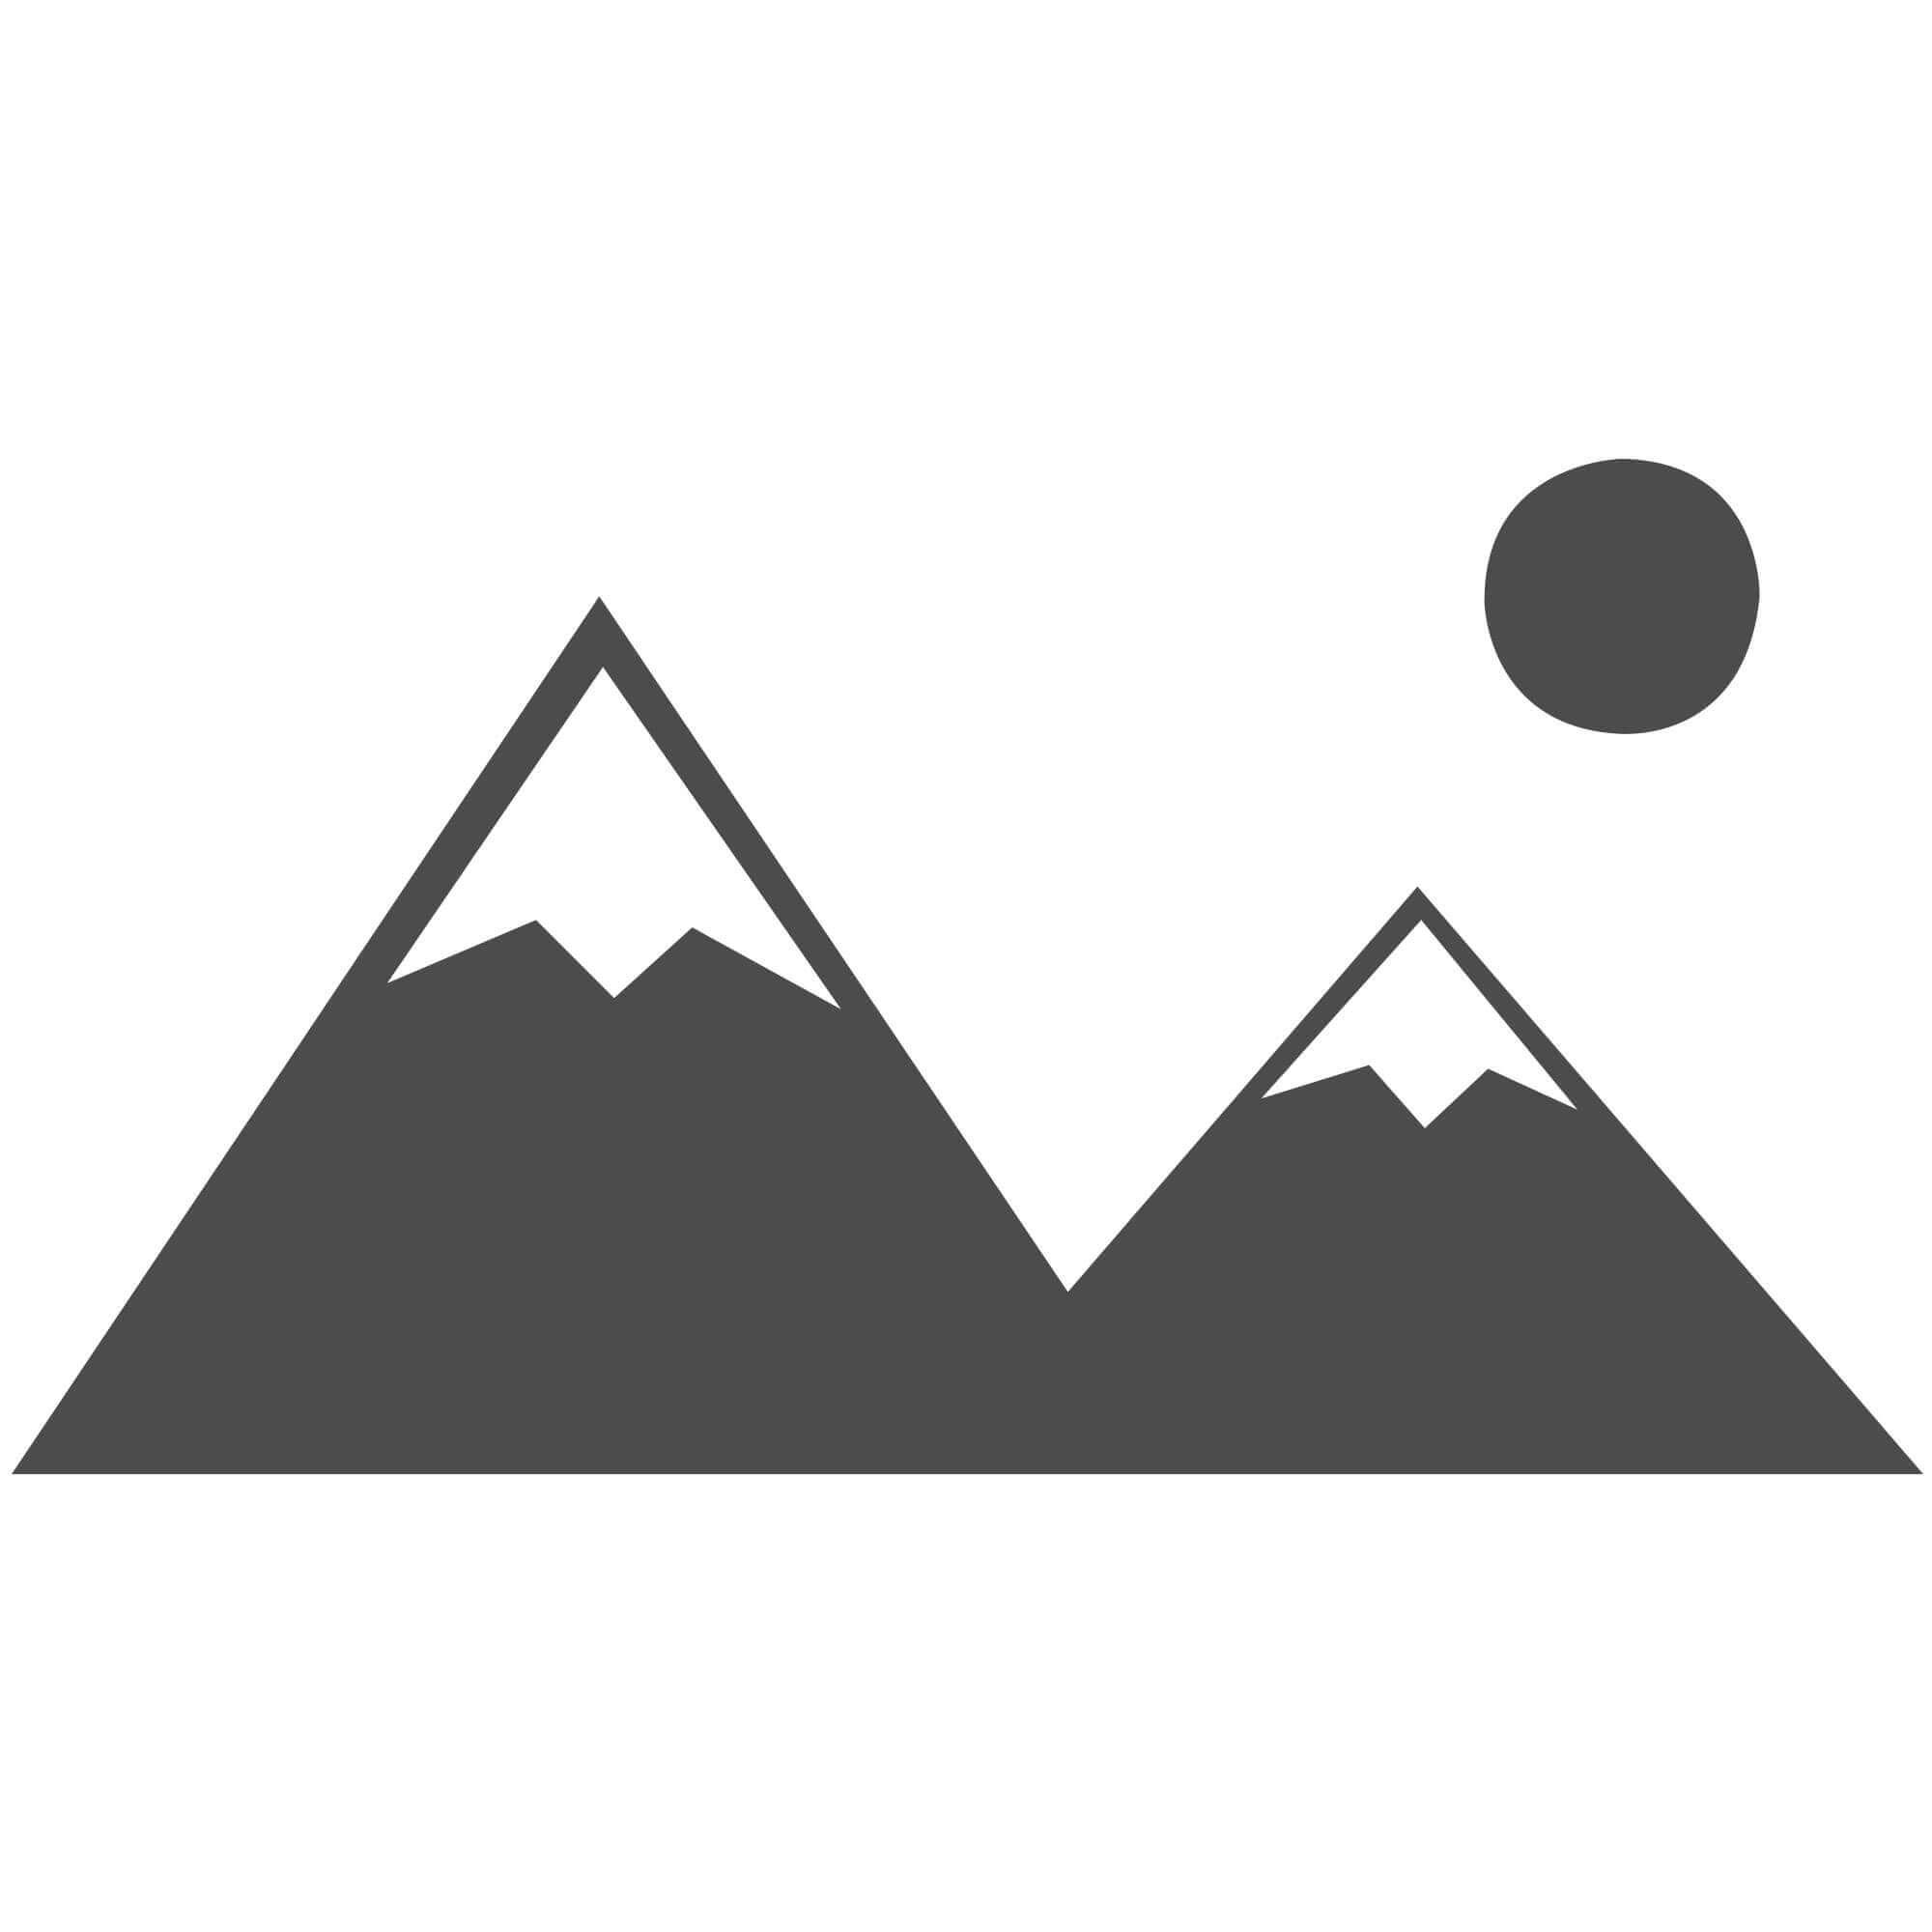 Softness Shaggy Rug Mint 60 X 120 Cm 2 X 3 11